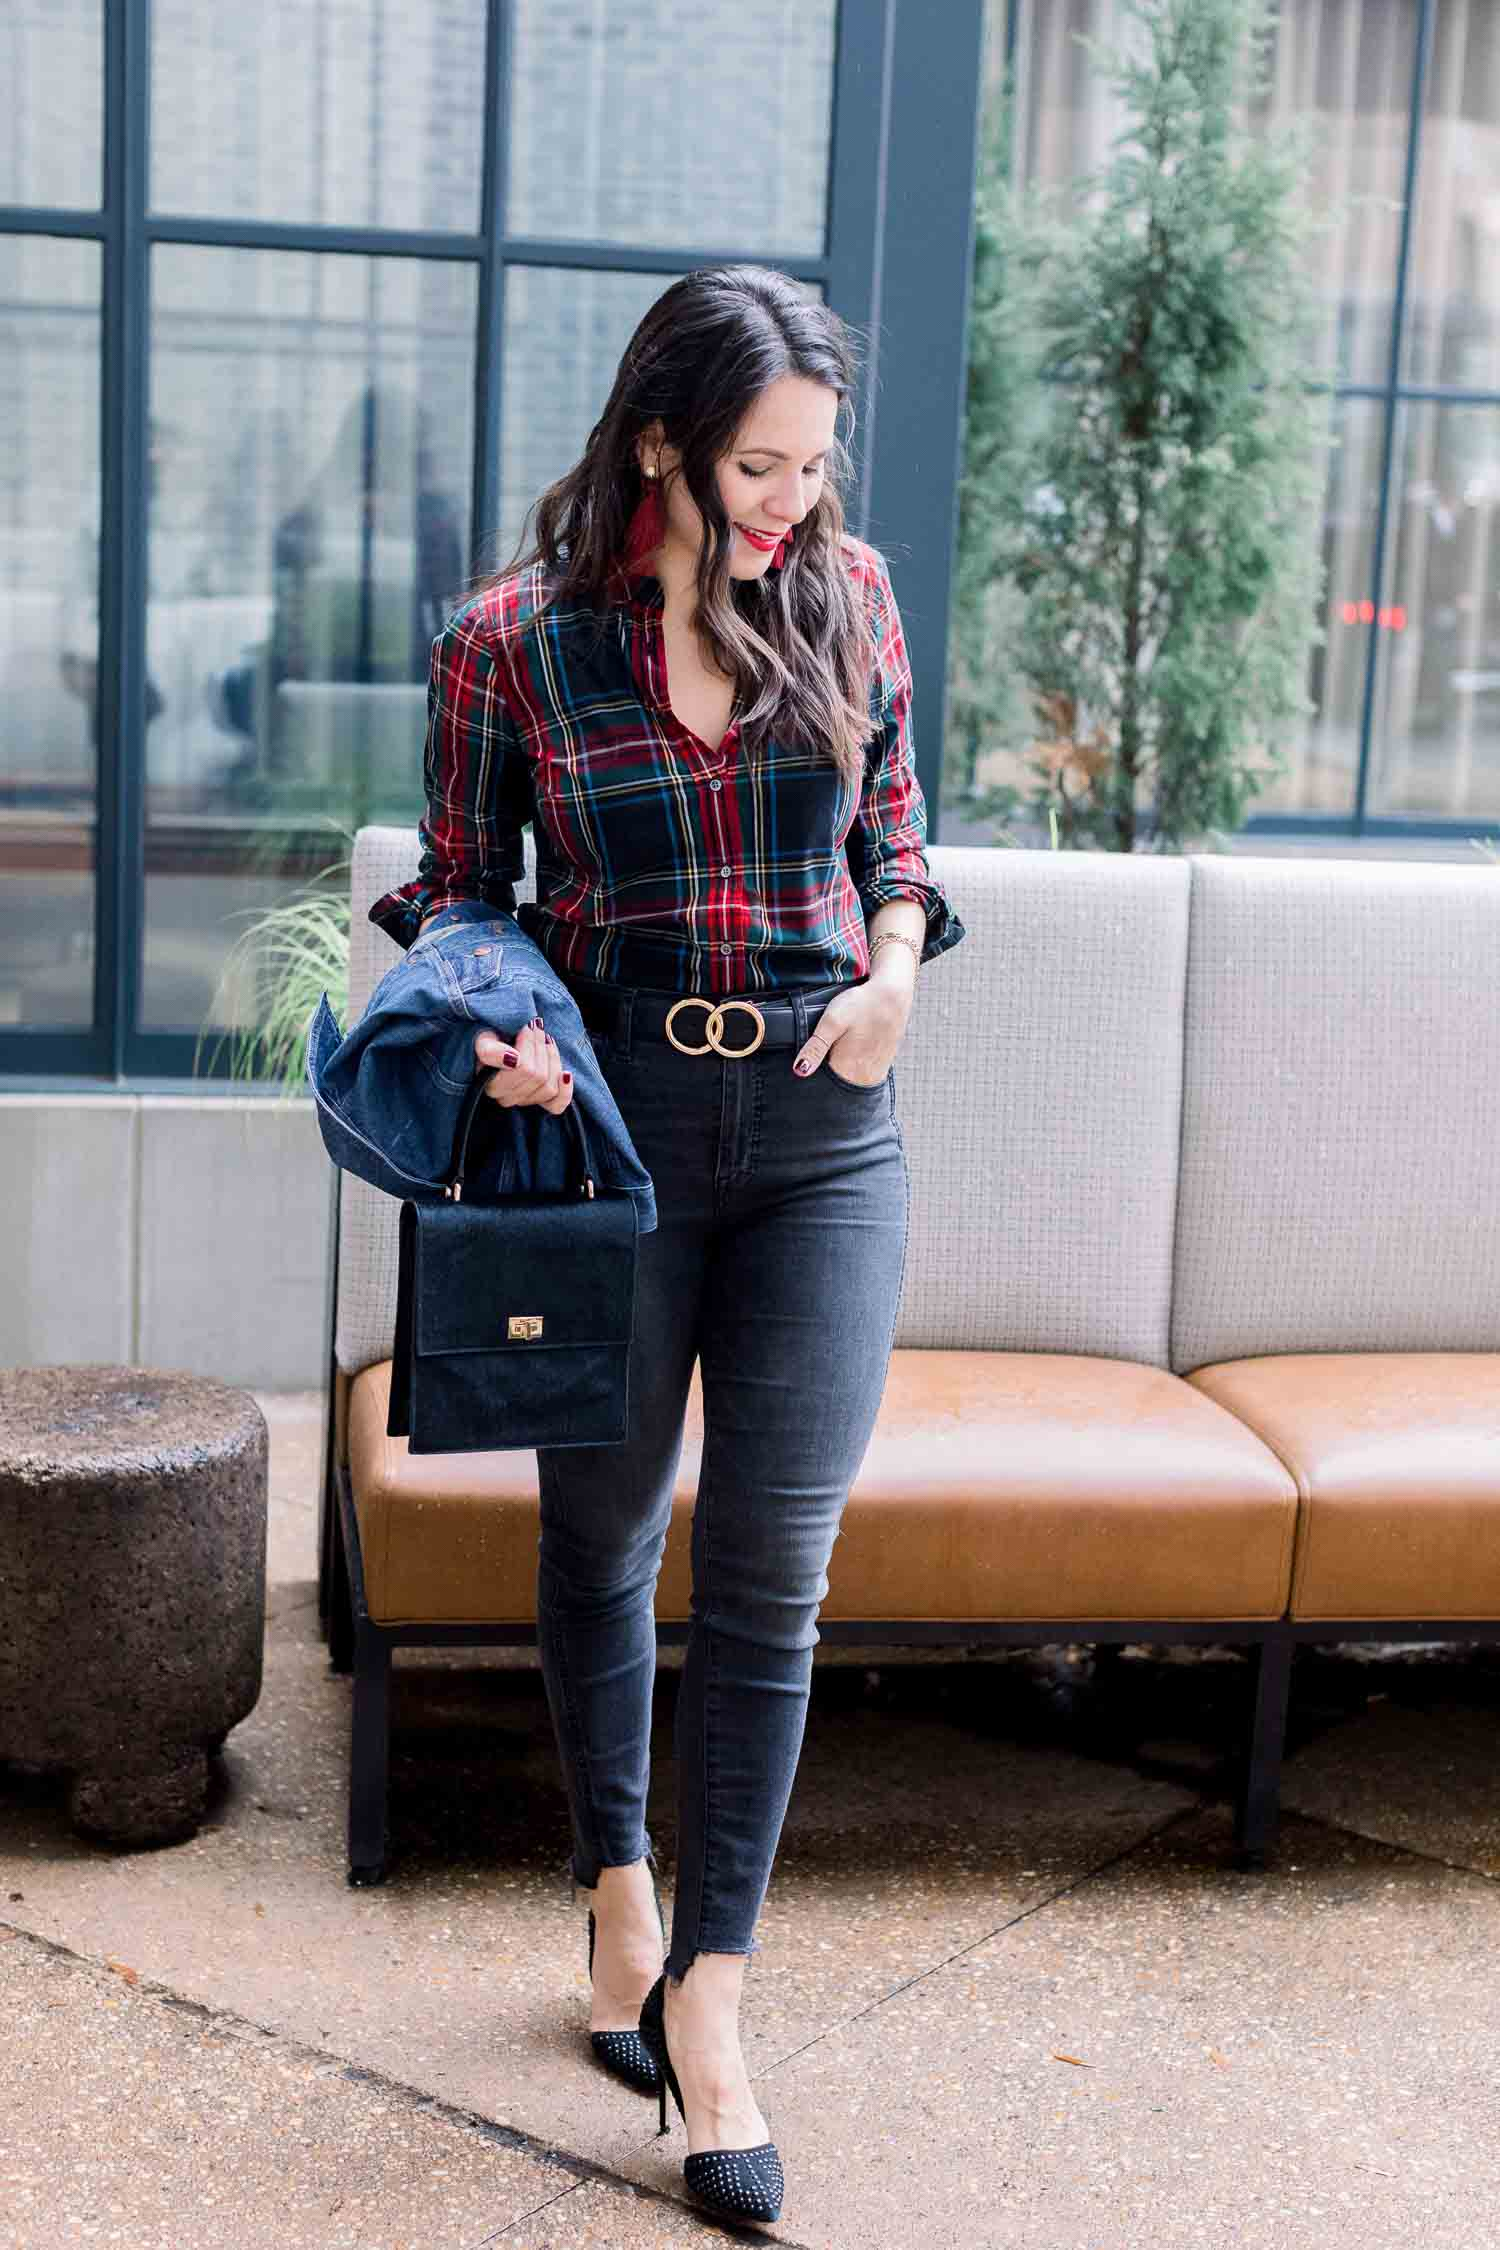 J. Crew Tartan Cotton Button Down • Madewell Jeans • Denim Jacket • Hart Earrings